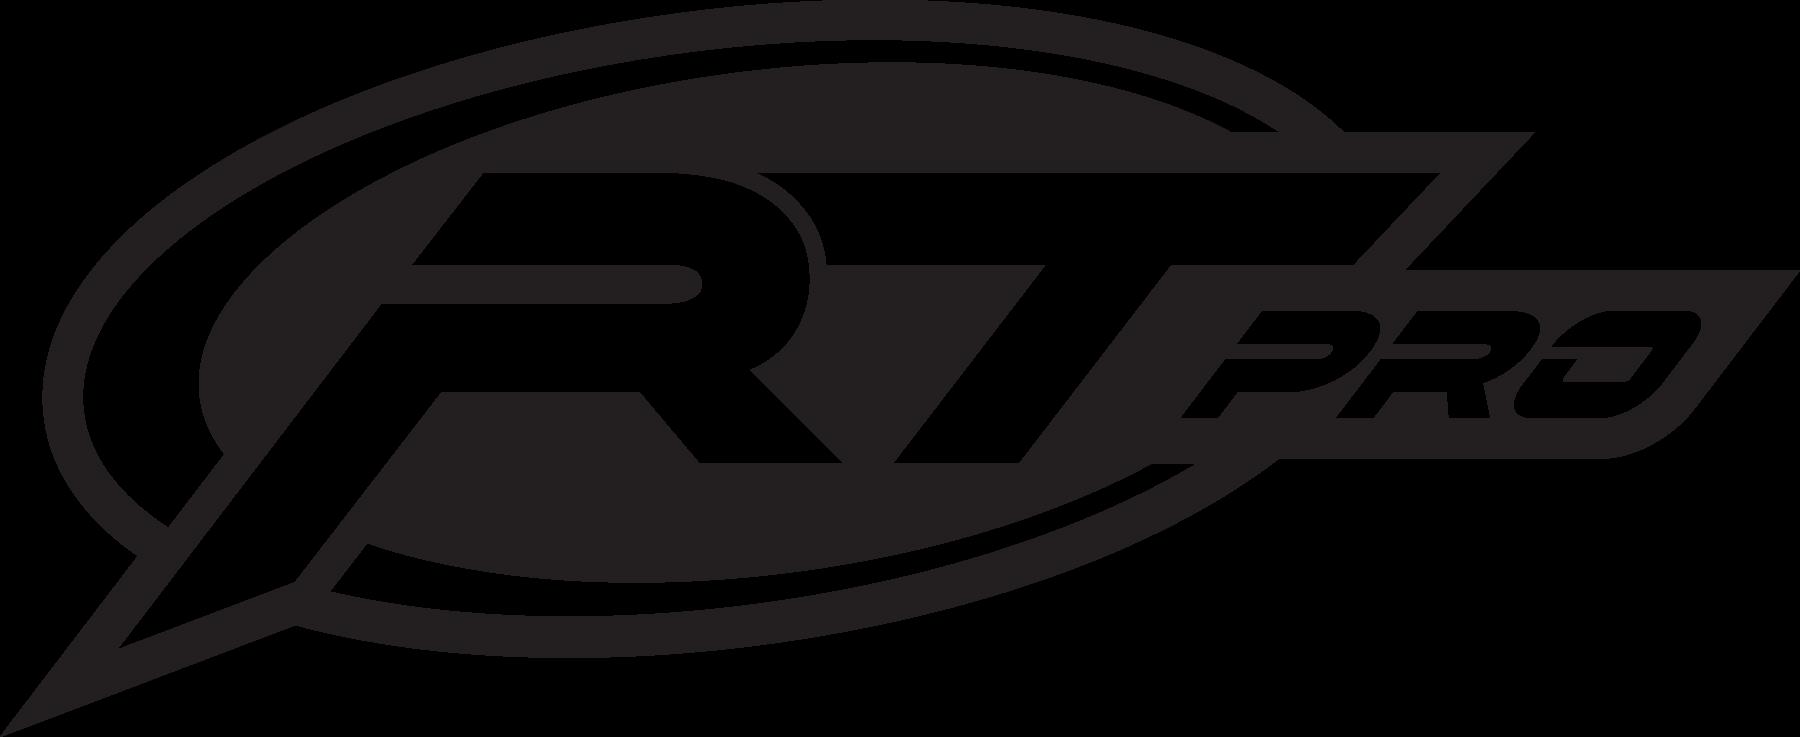 RTP-2a